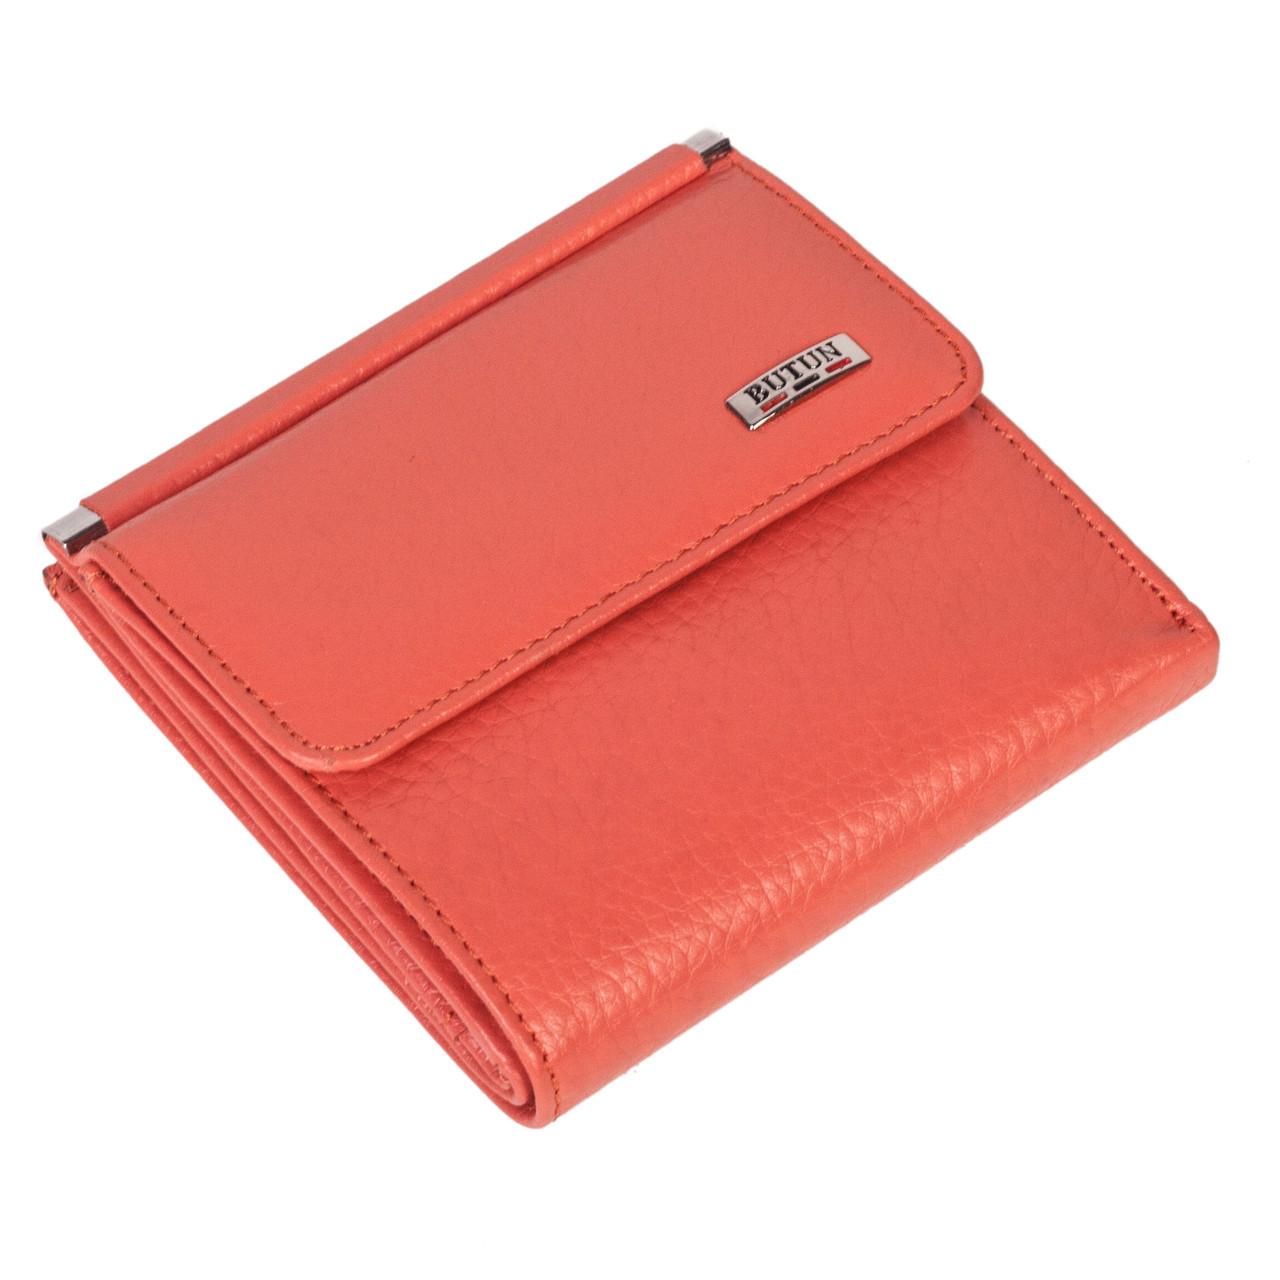 Женский кошелек Butun 590-004-046 кожаный коралловый